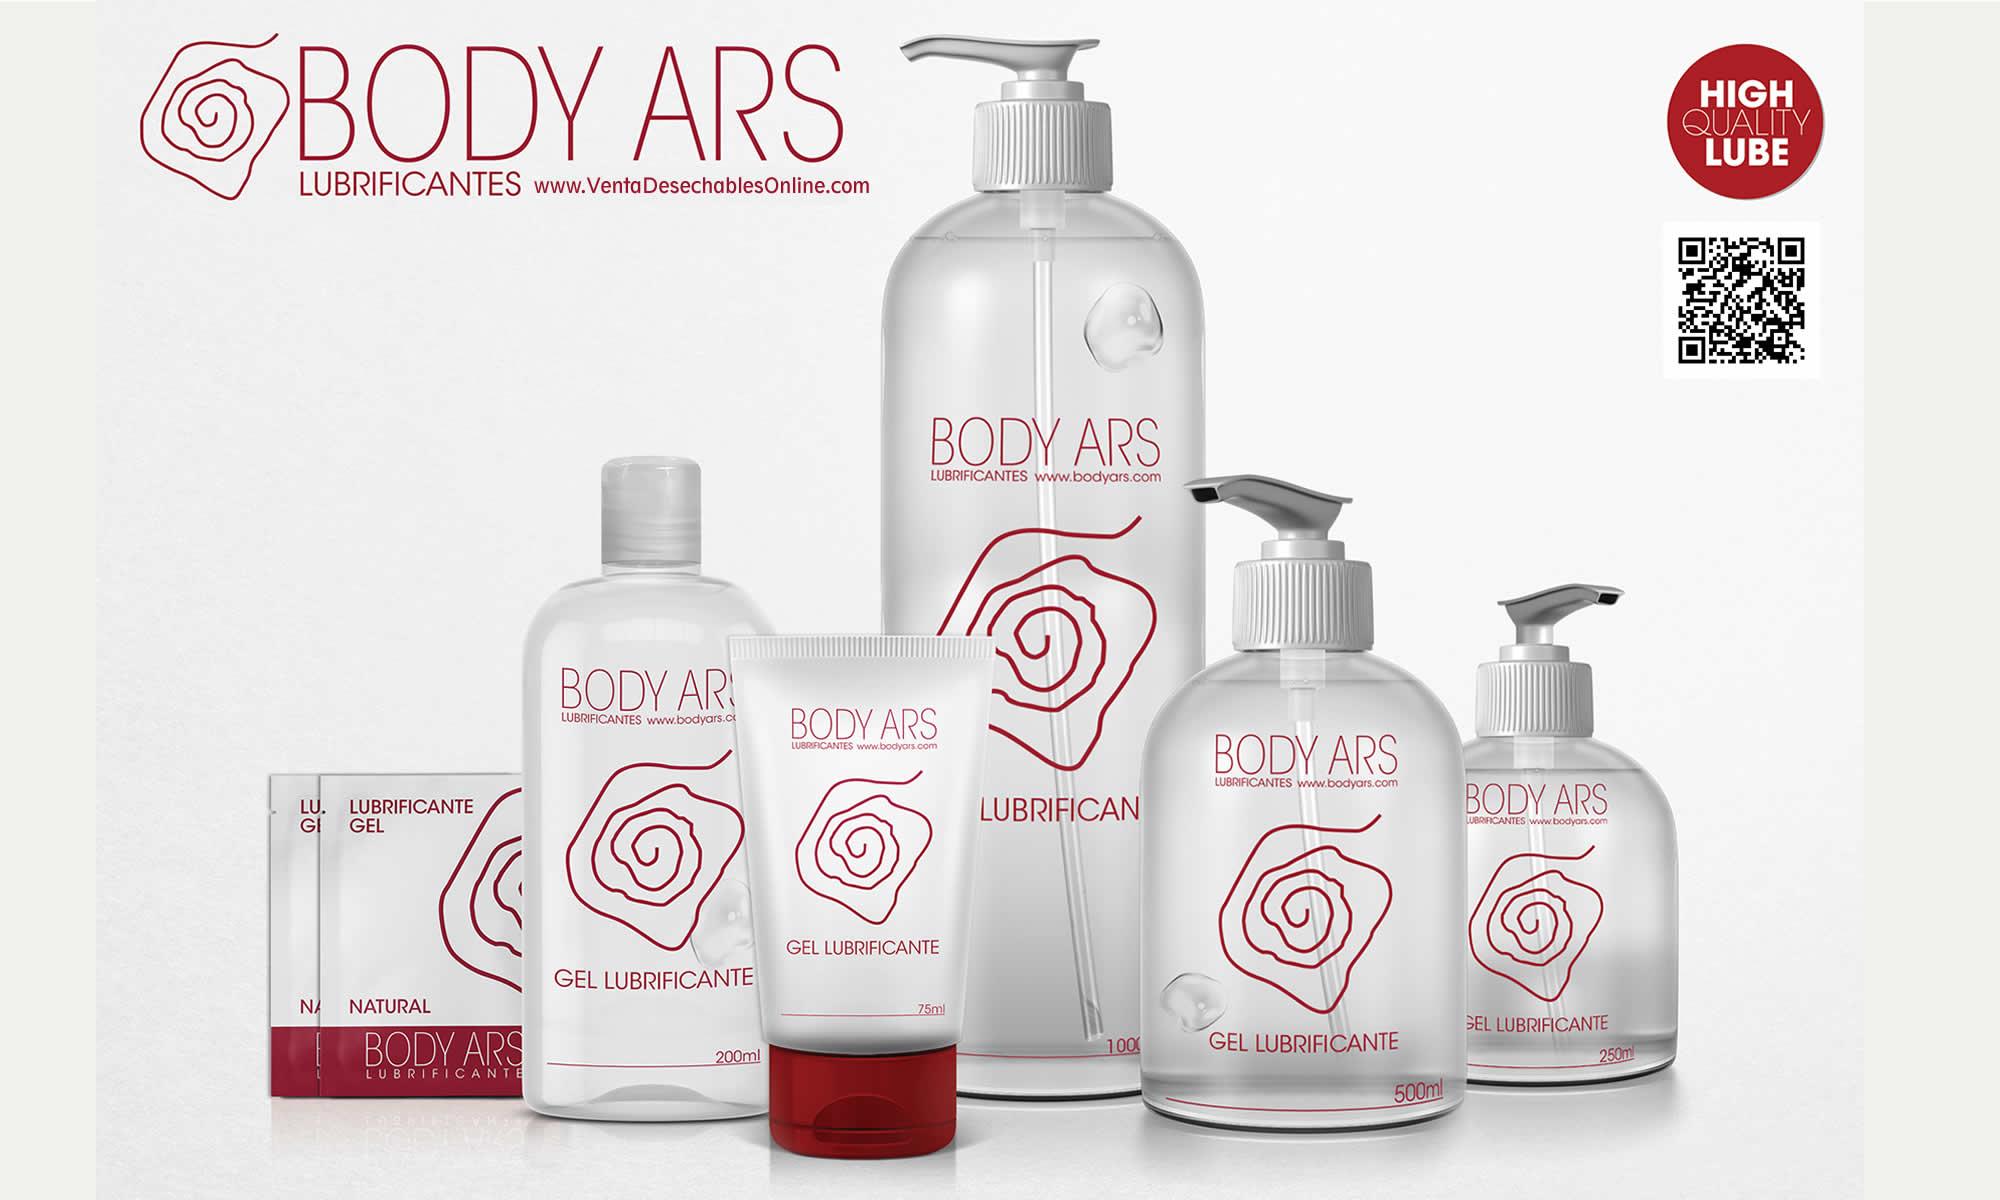 Lubricantes Body Ars